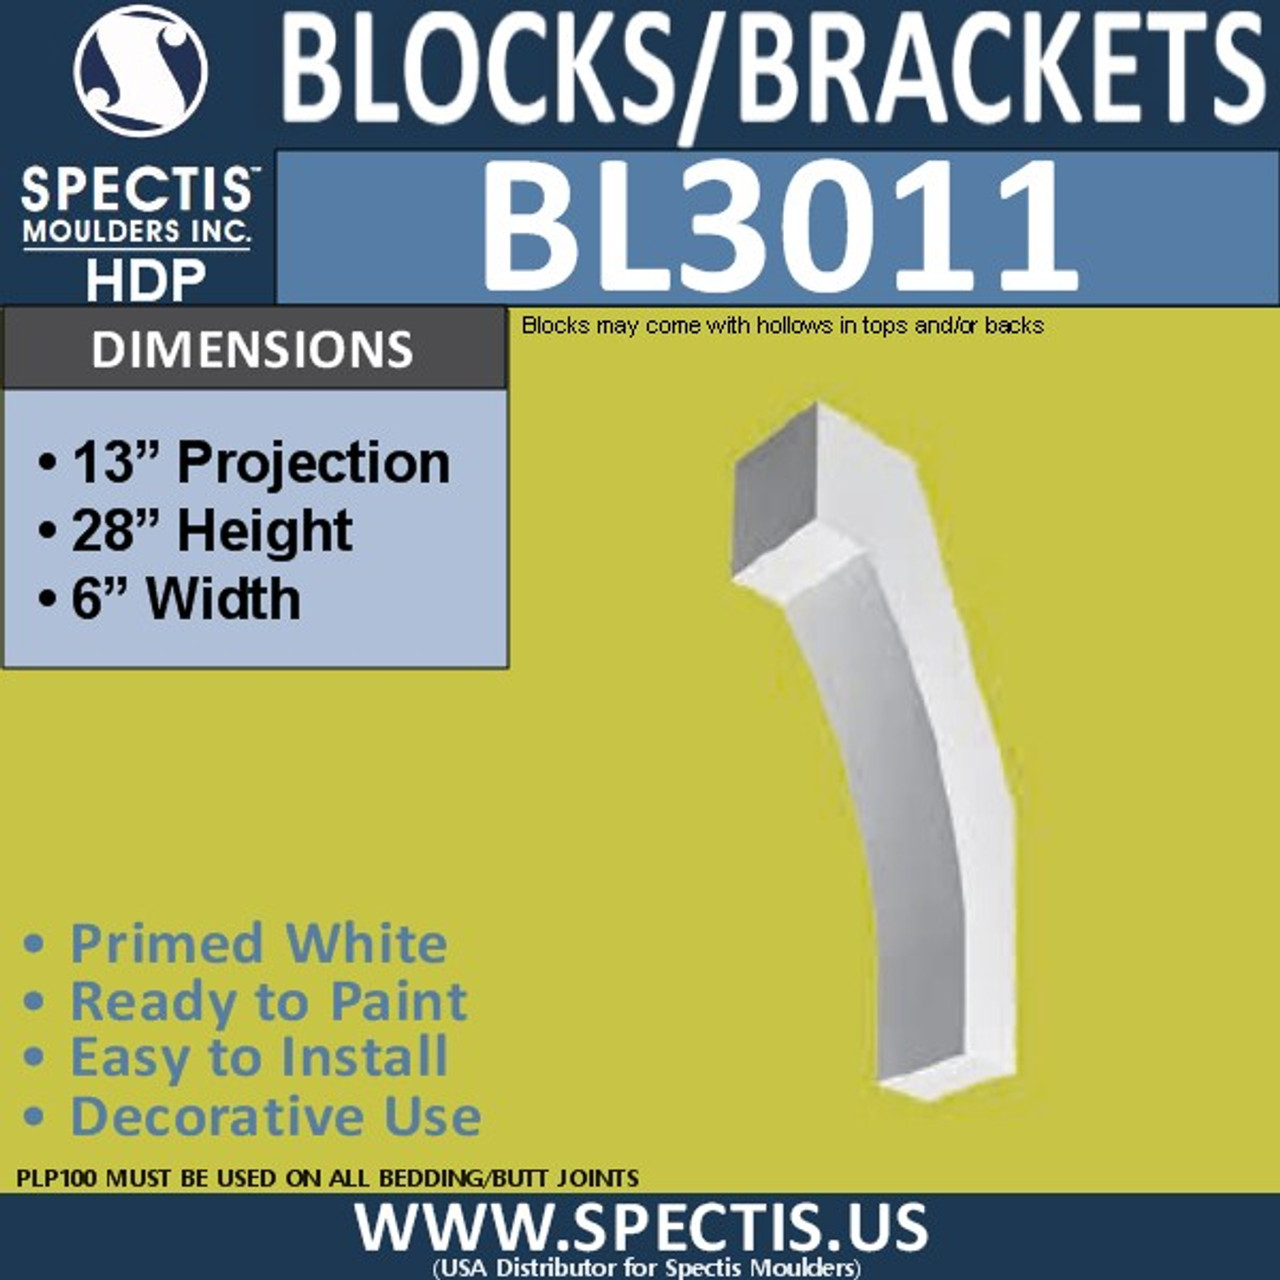 "BL3011 Eave Block or Bracket 6""W x 28""H x 13"" P"